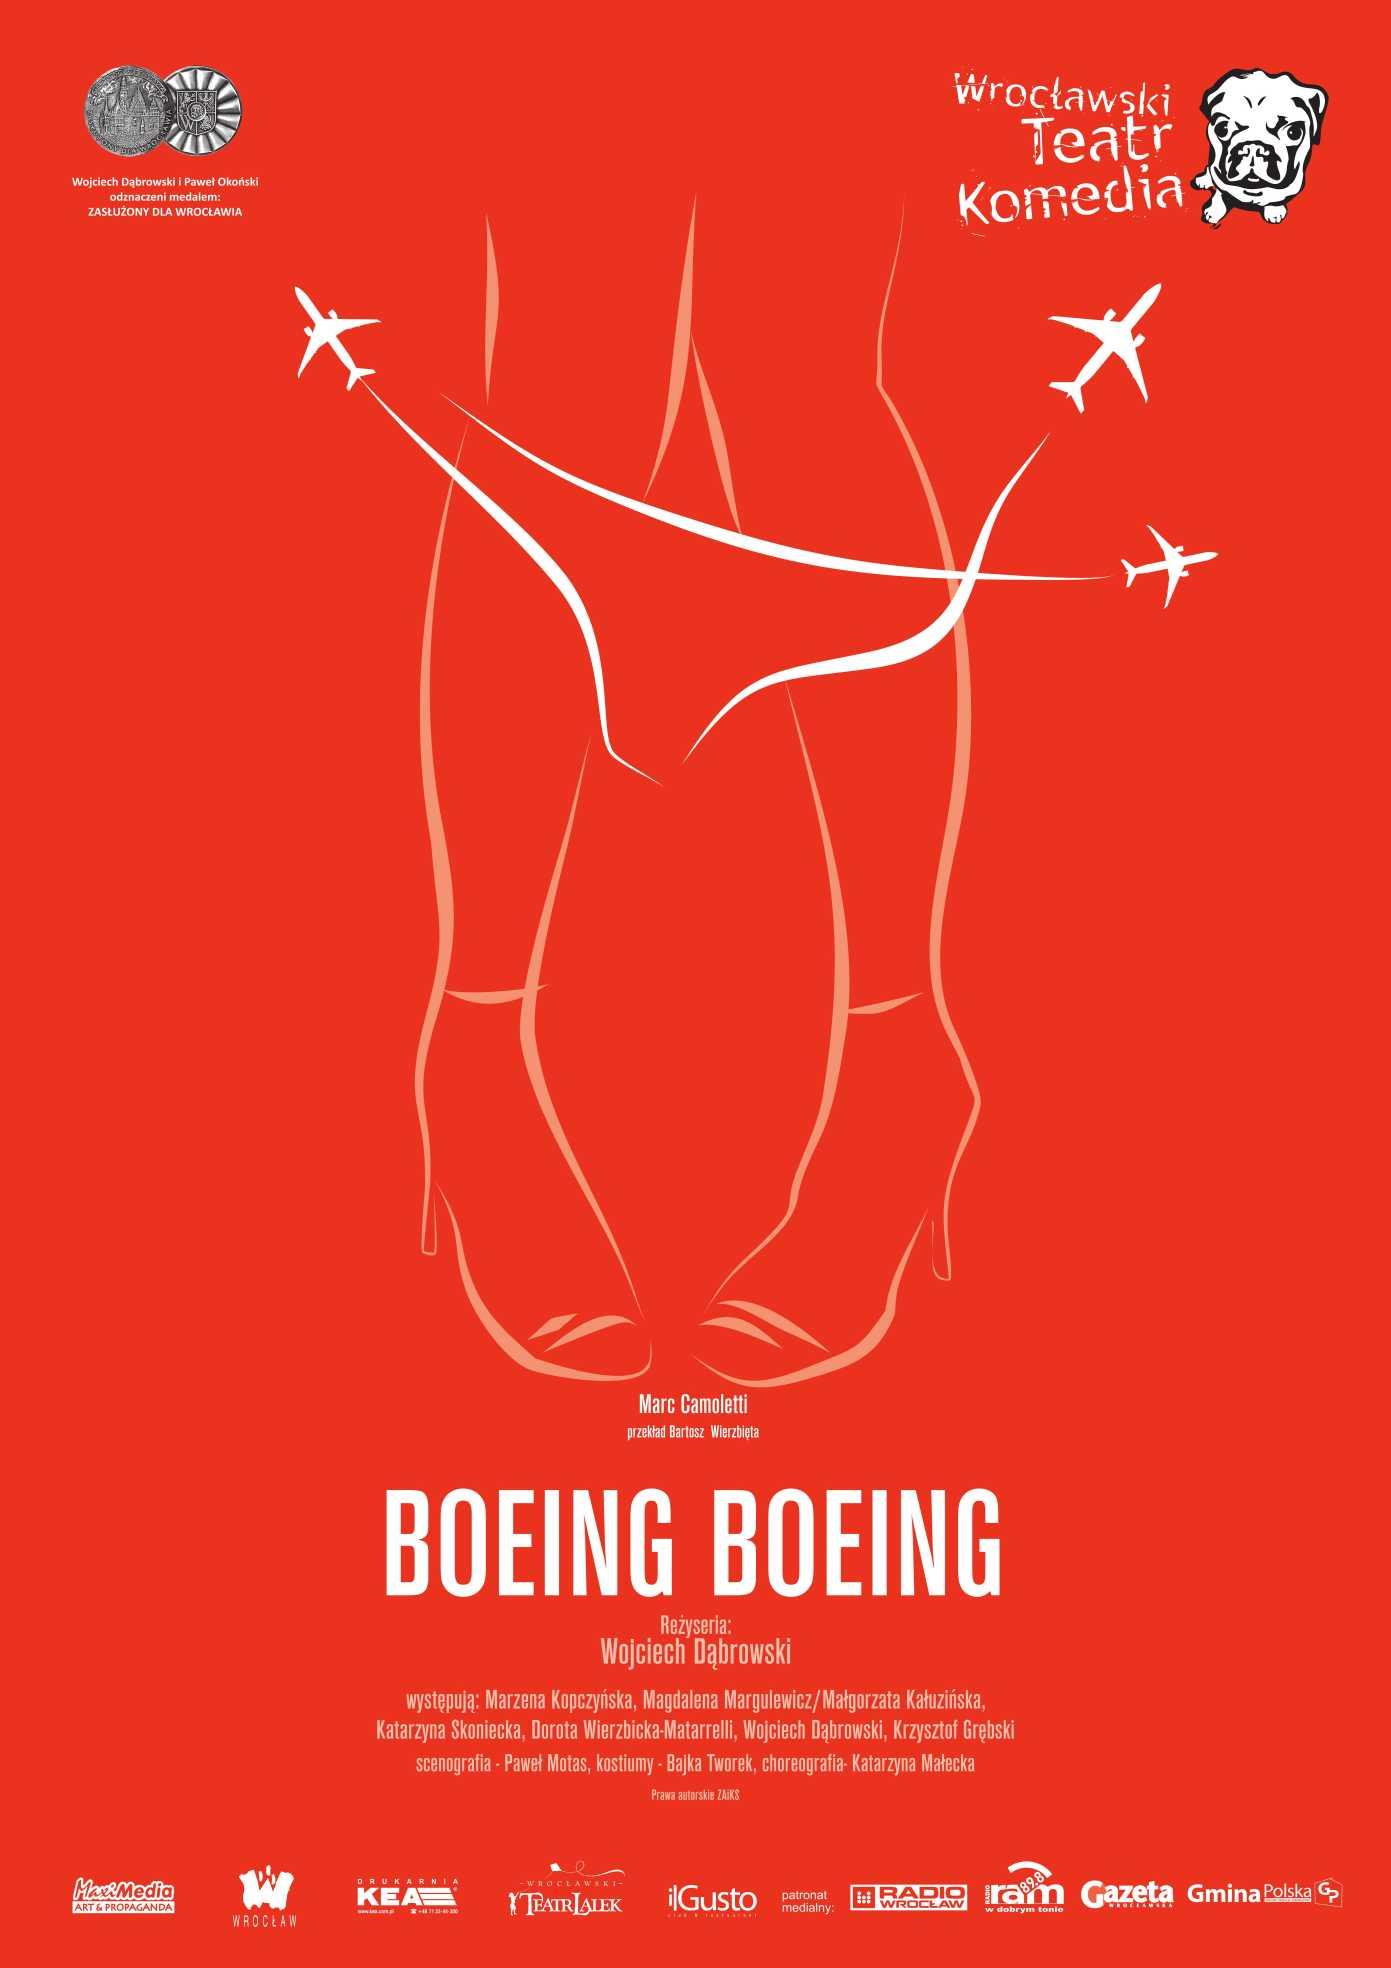 plakat boening boening-1-12